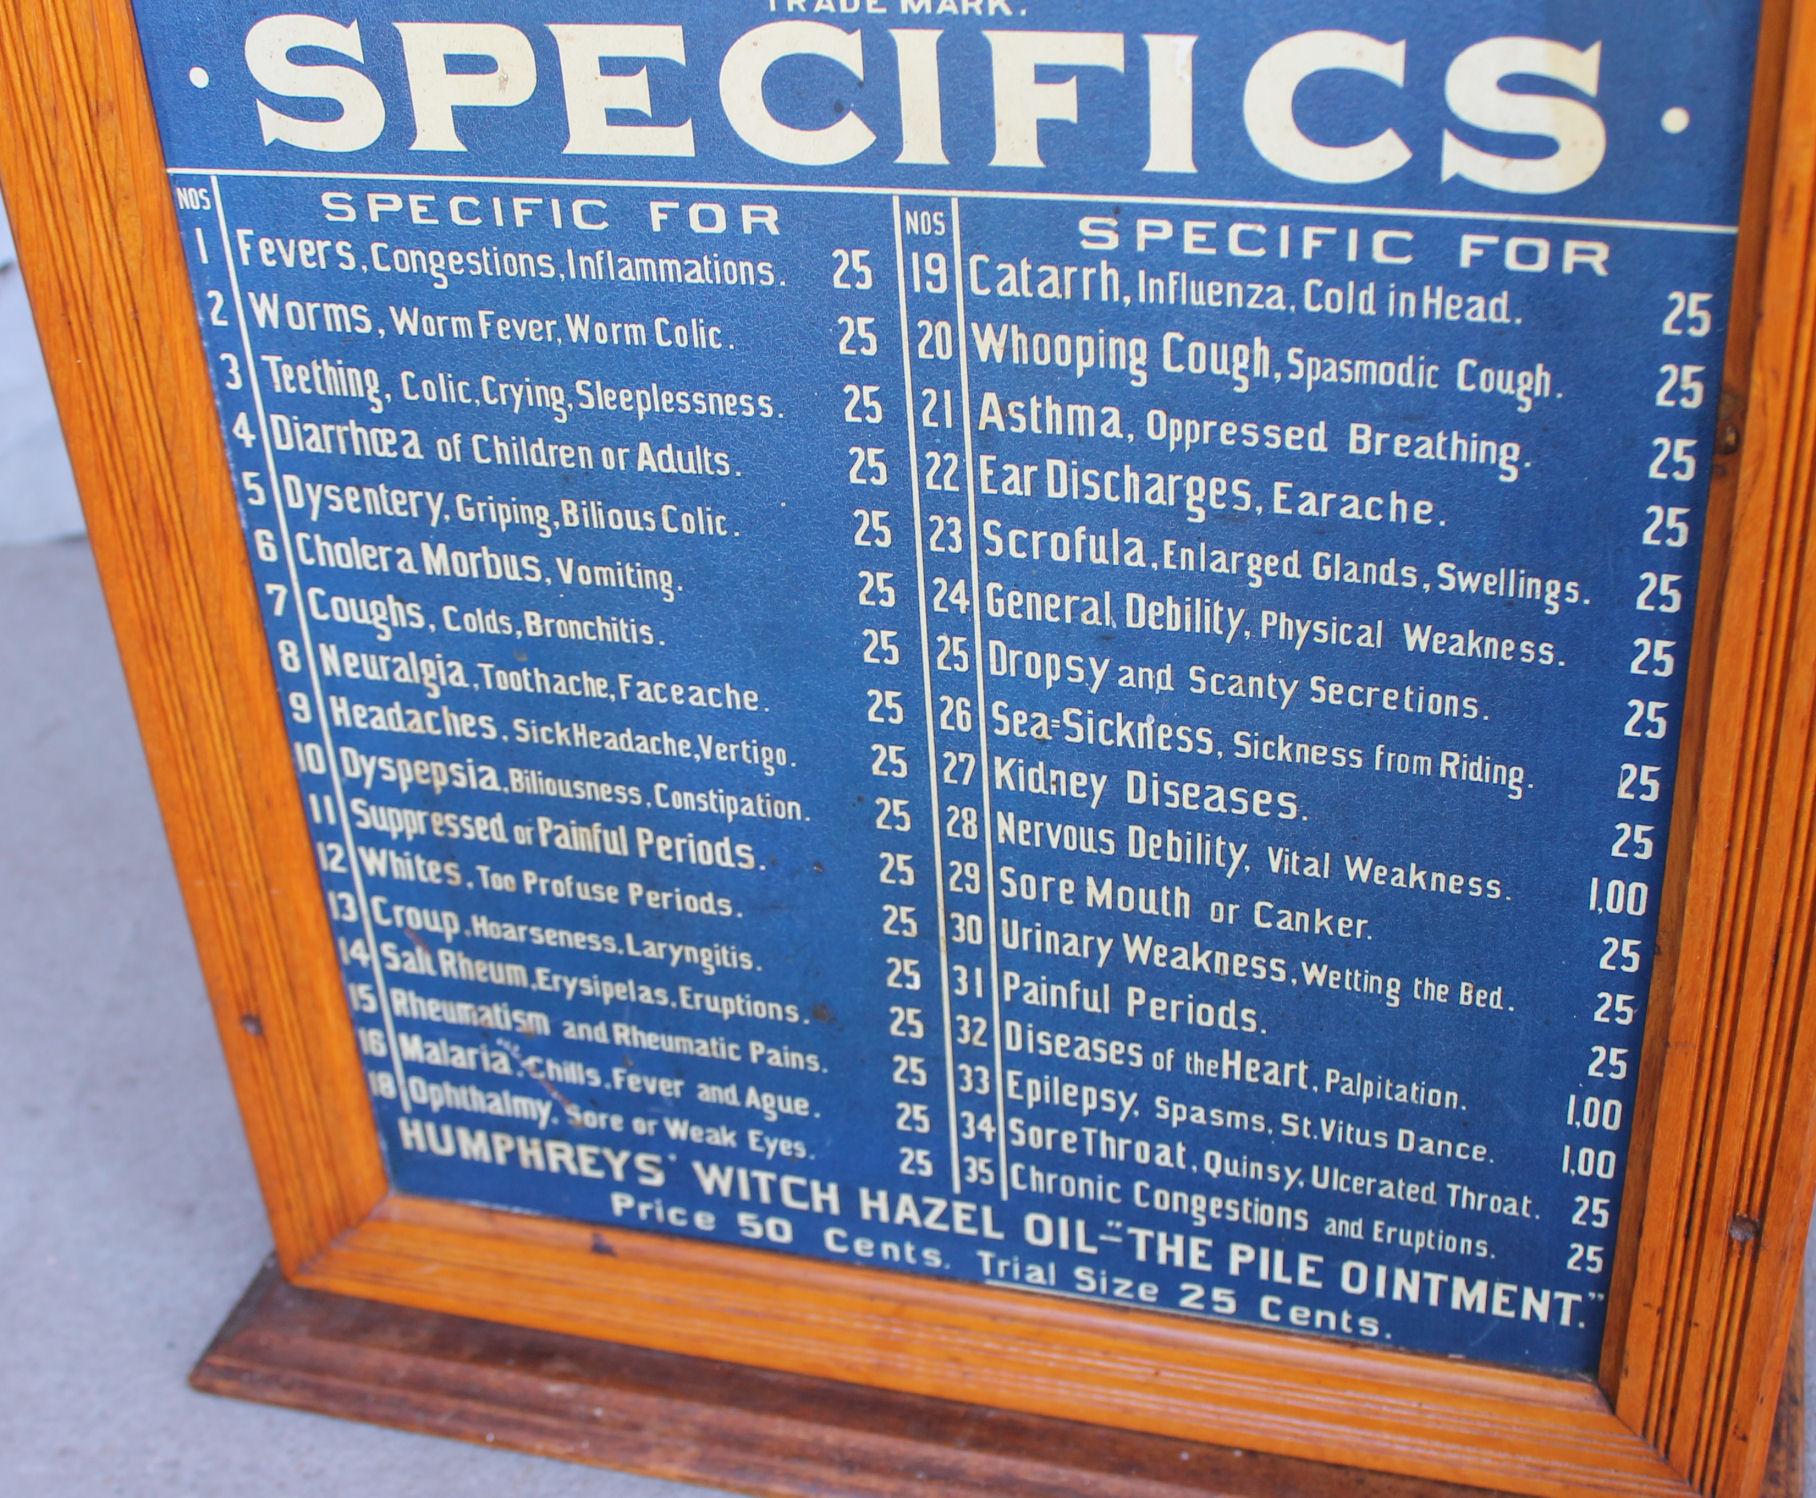 Bargain John S Antiques Humphreys Specifics Apothecary